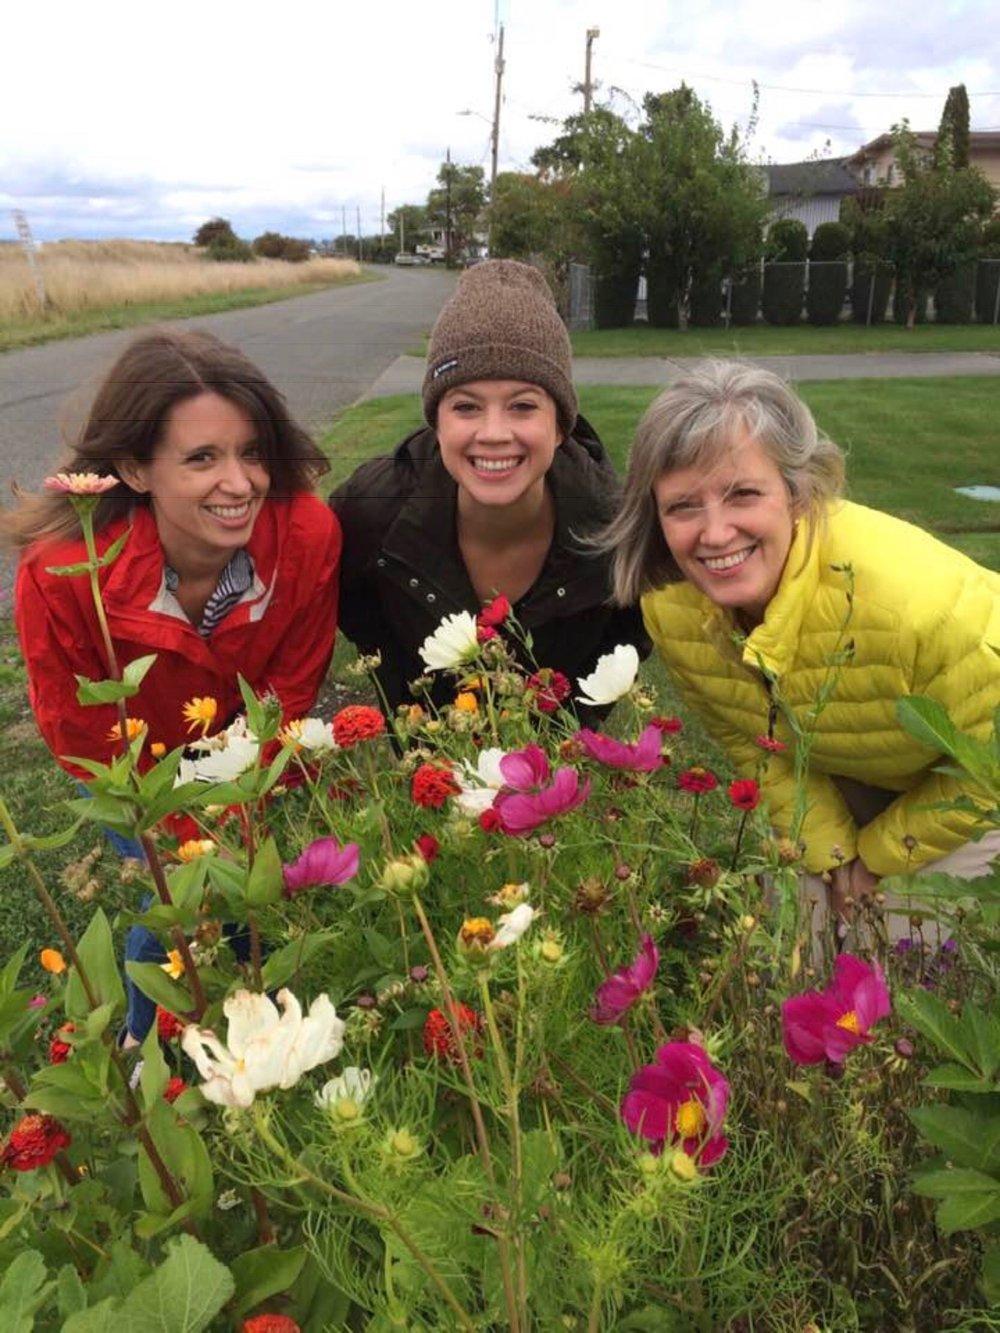 Ellen, Janet, & Jane (Camano, WA)